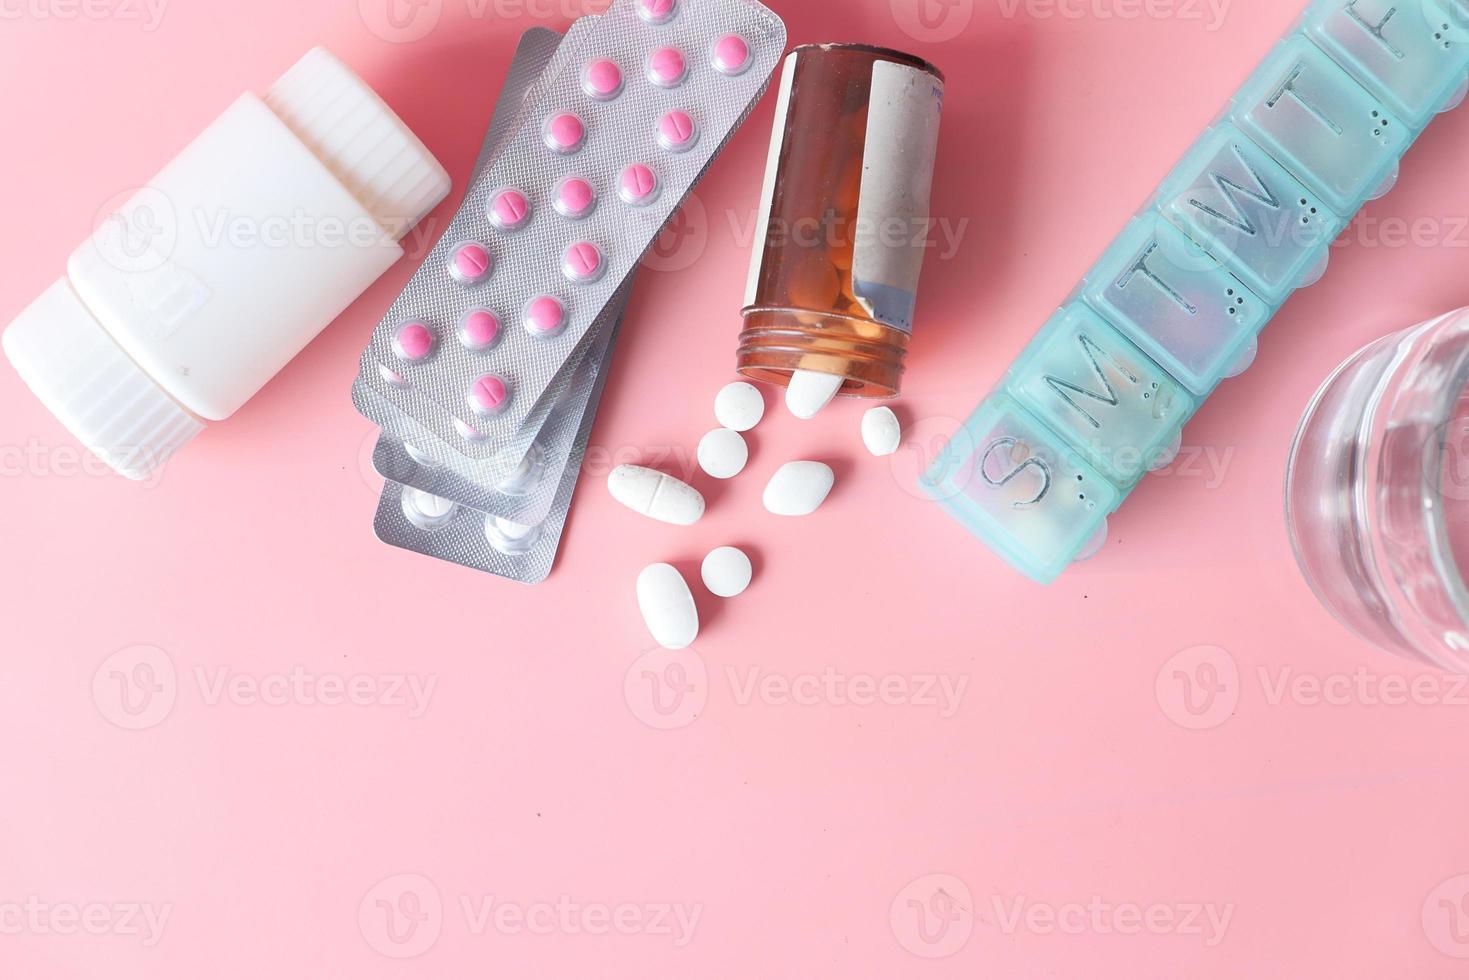 vista superior de comprimidos em fundo rosa foto